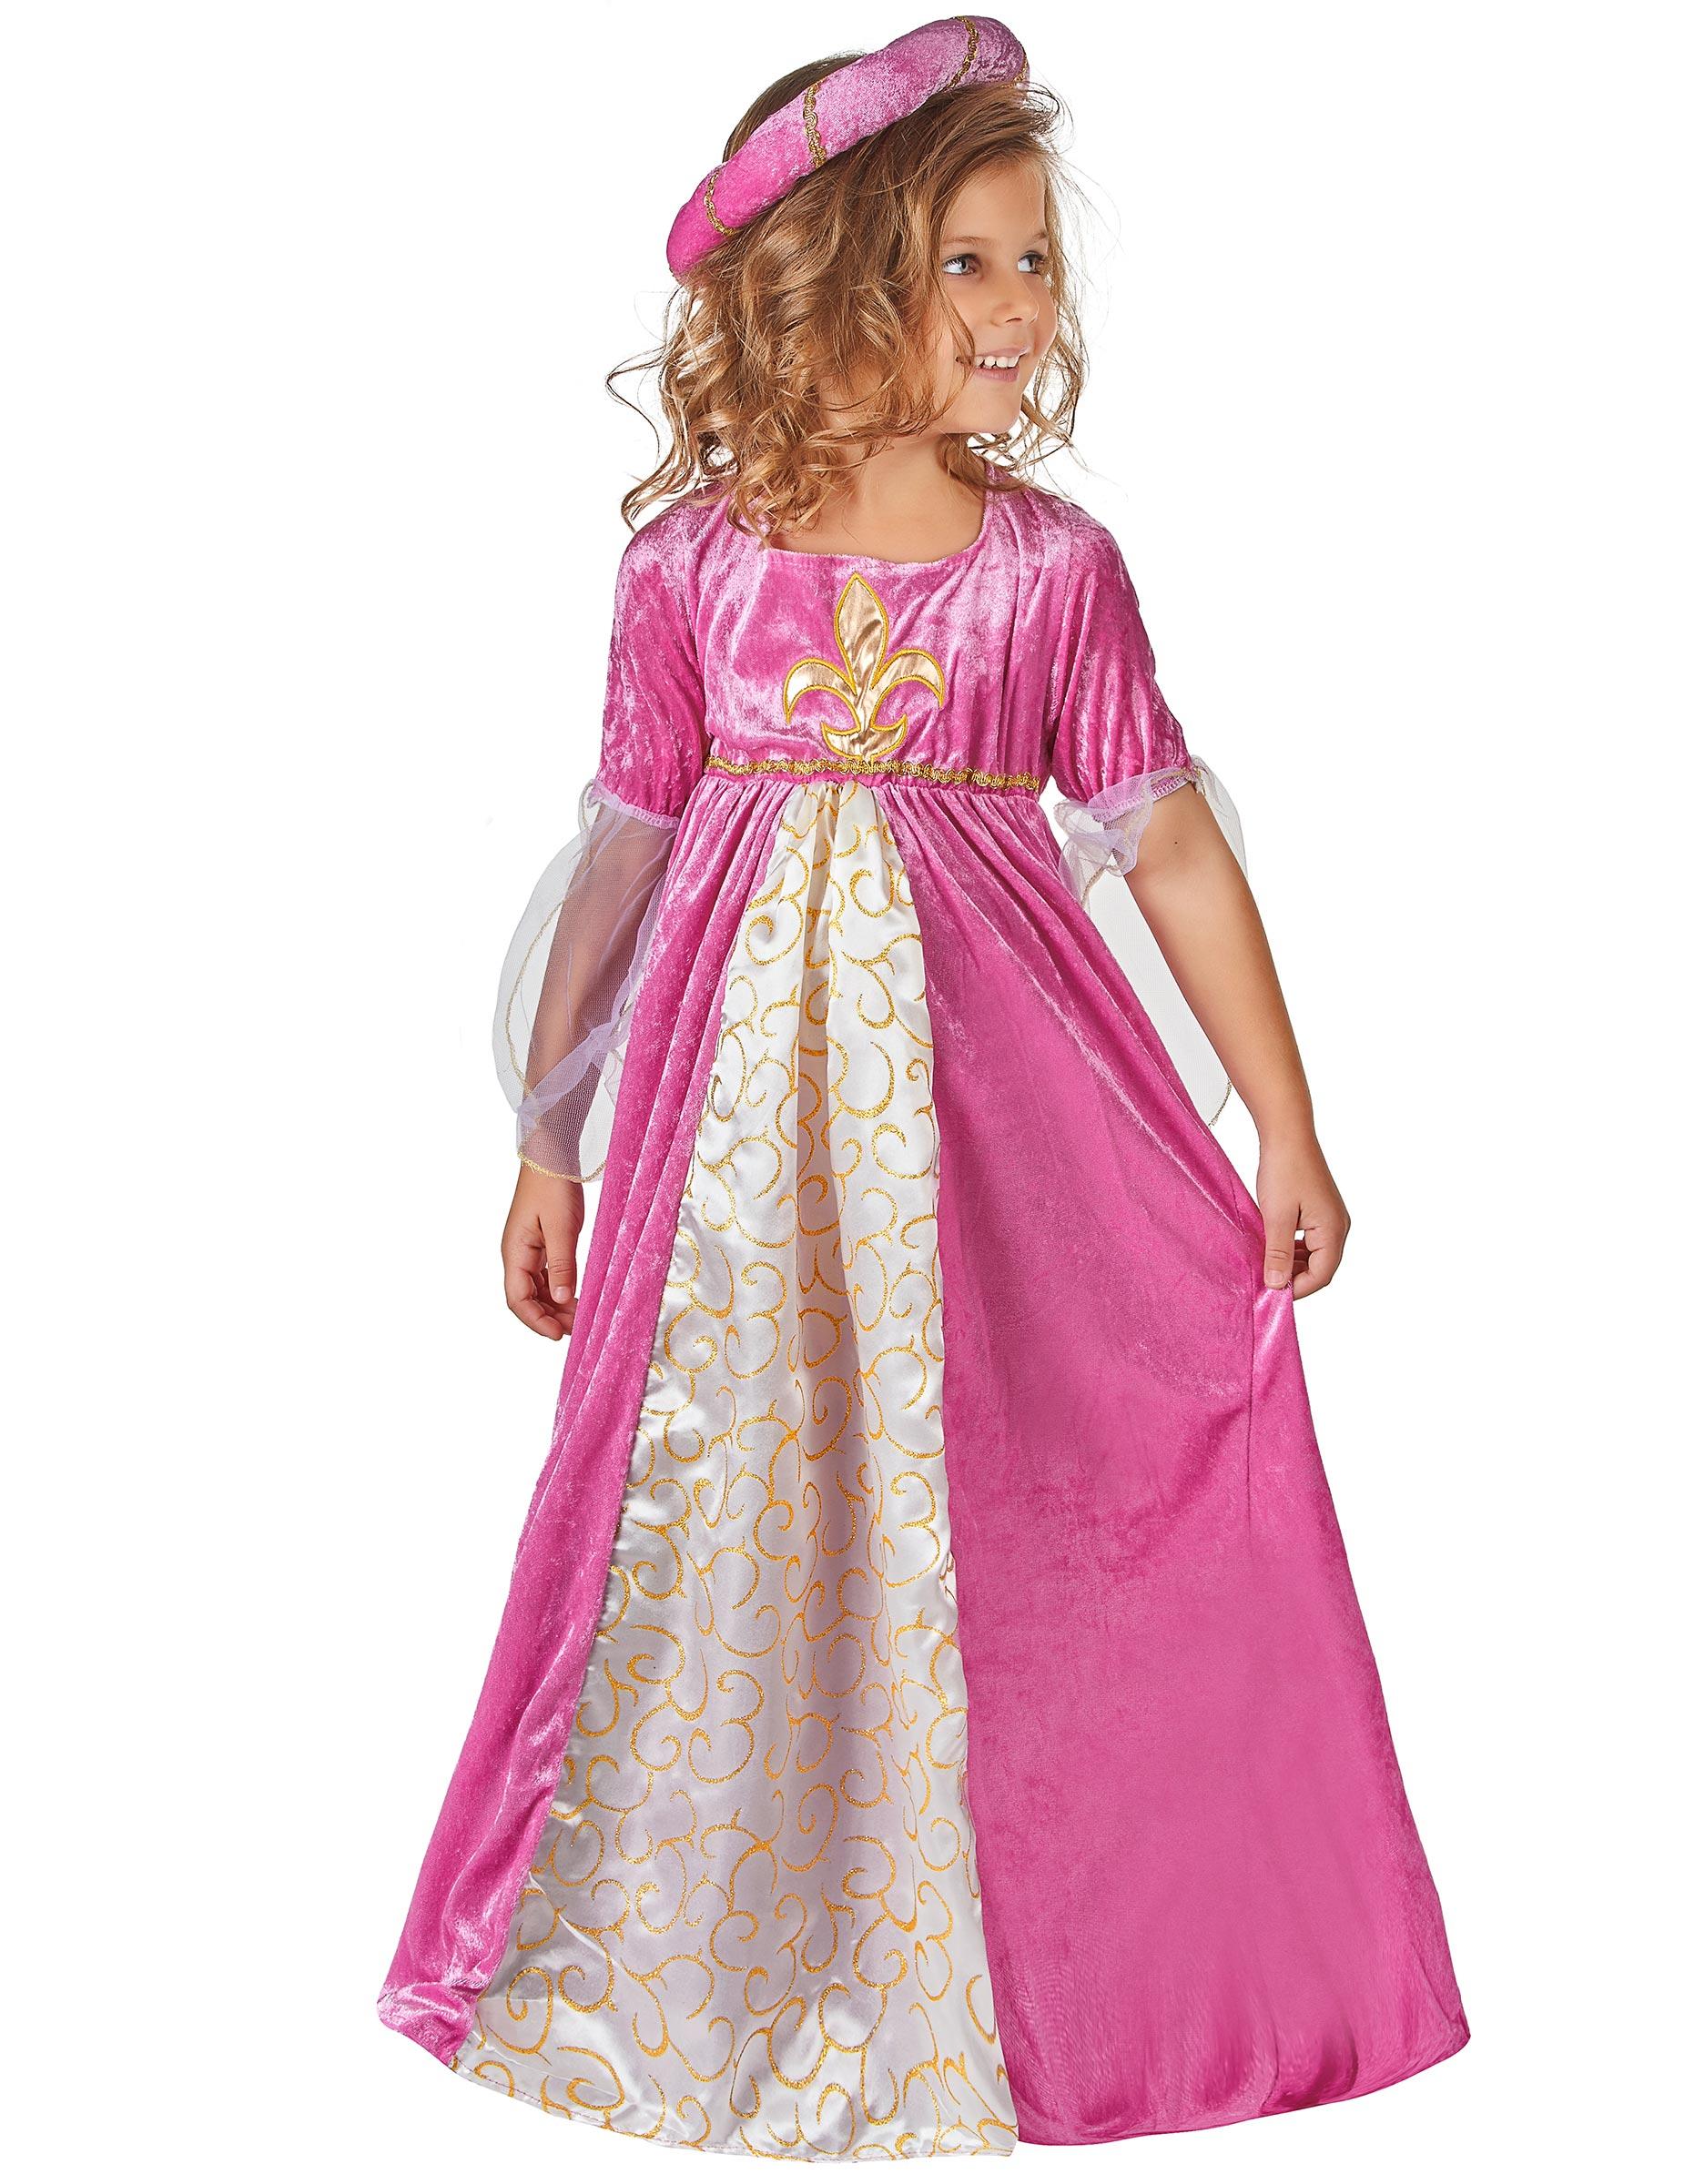 Costumi da principessa per bambine e per adulti - Vegaoo.it 92352c4ab0d